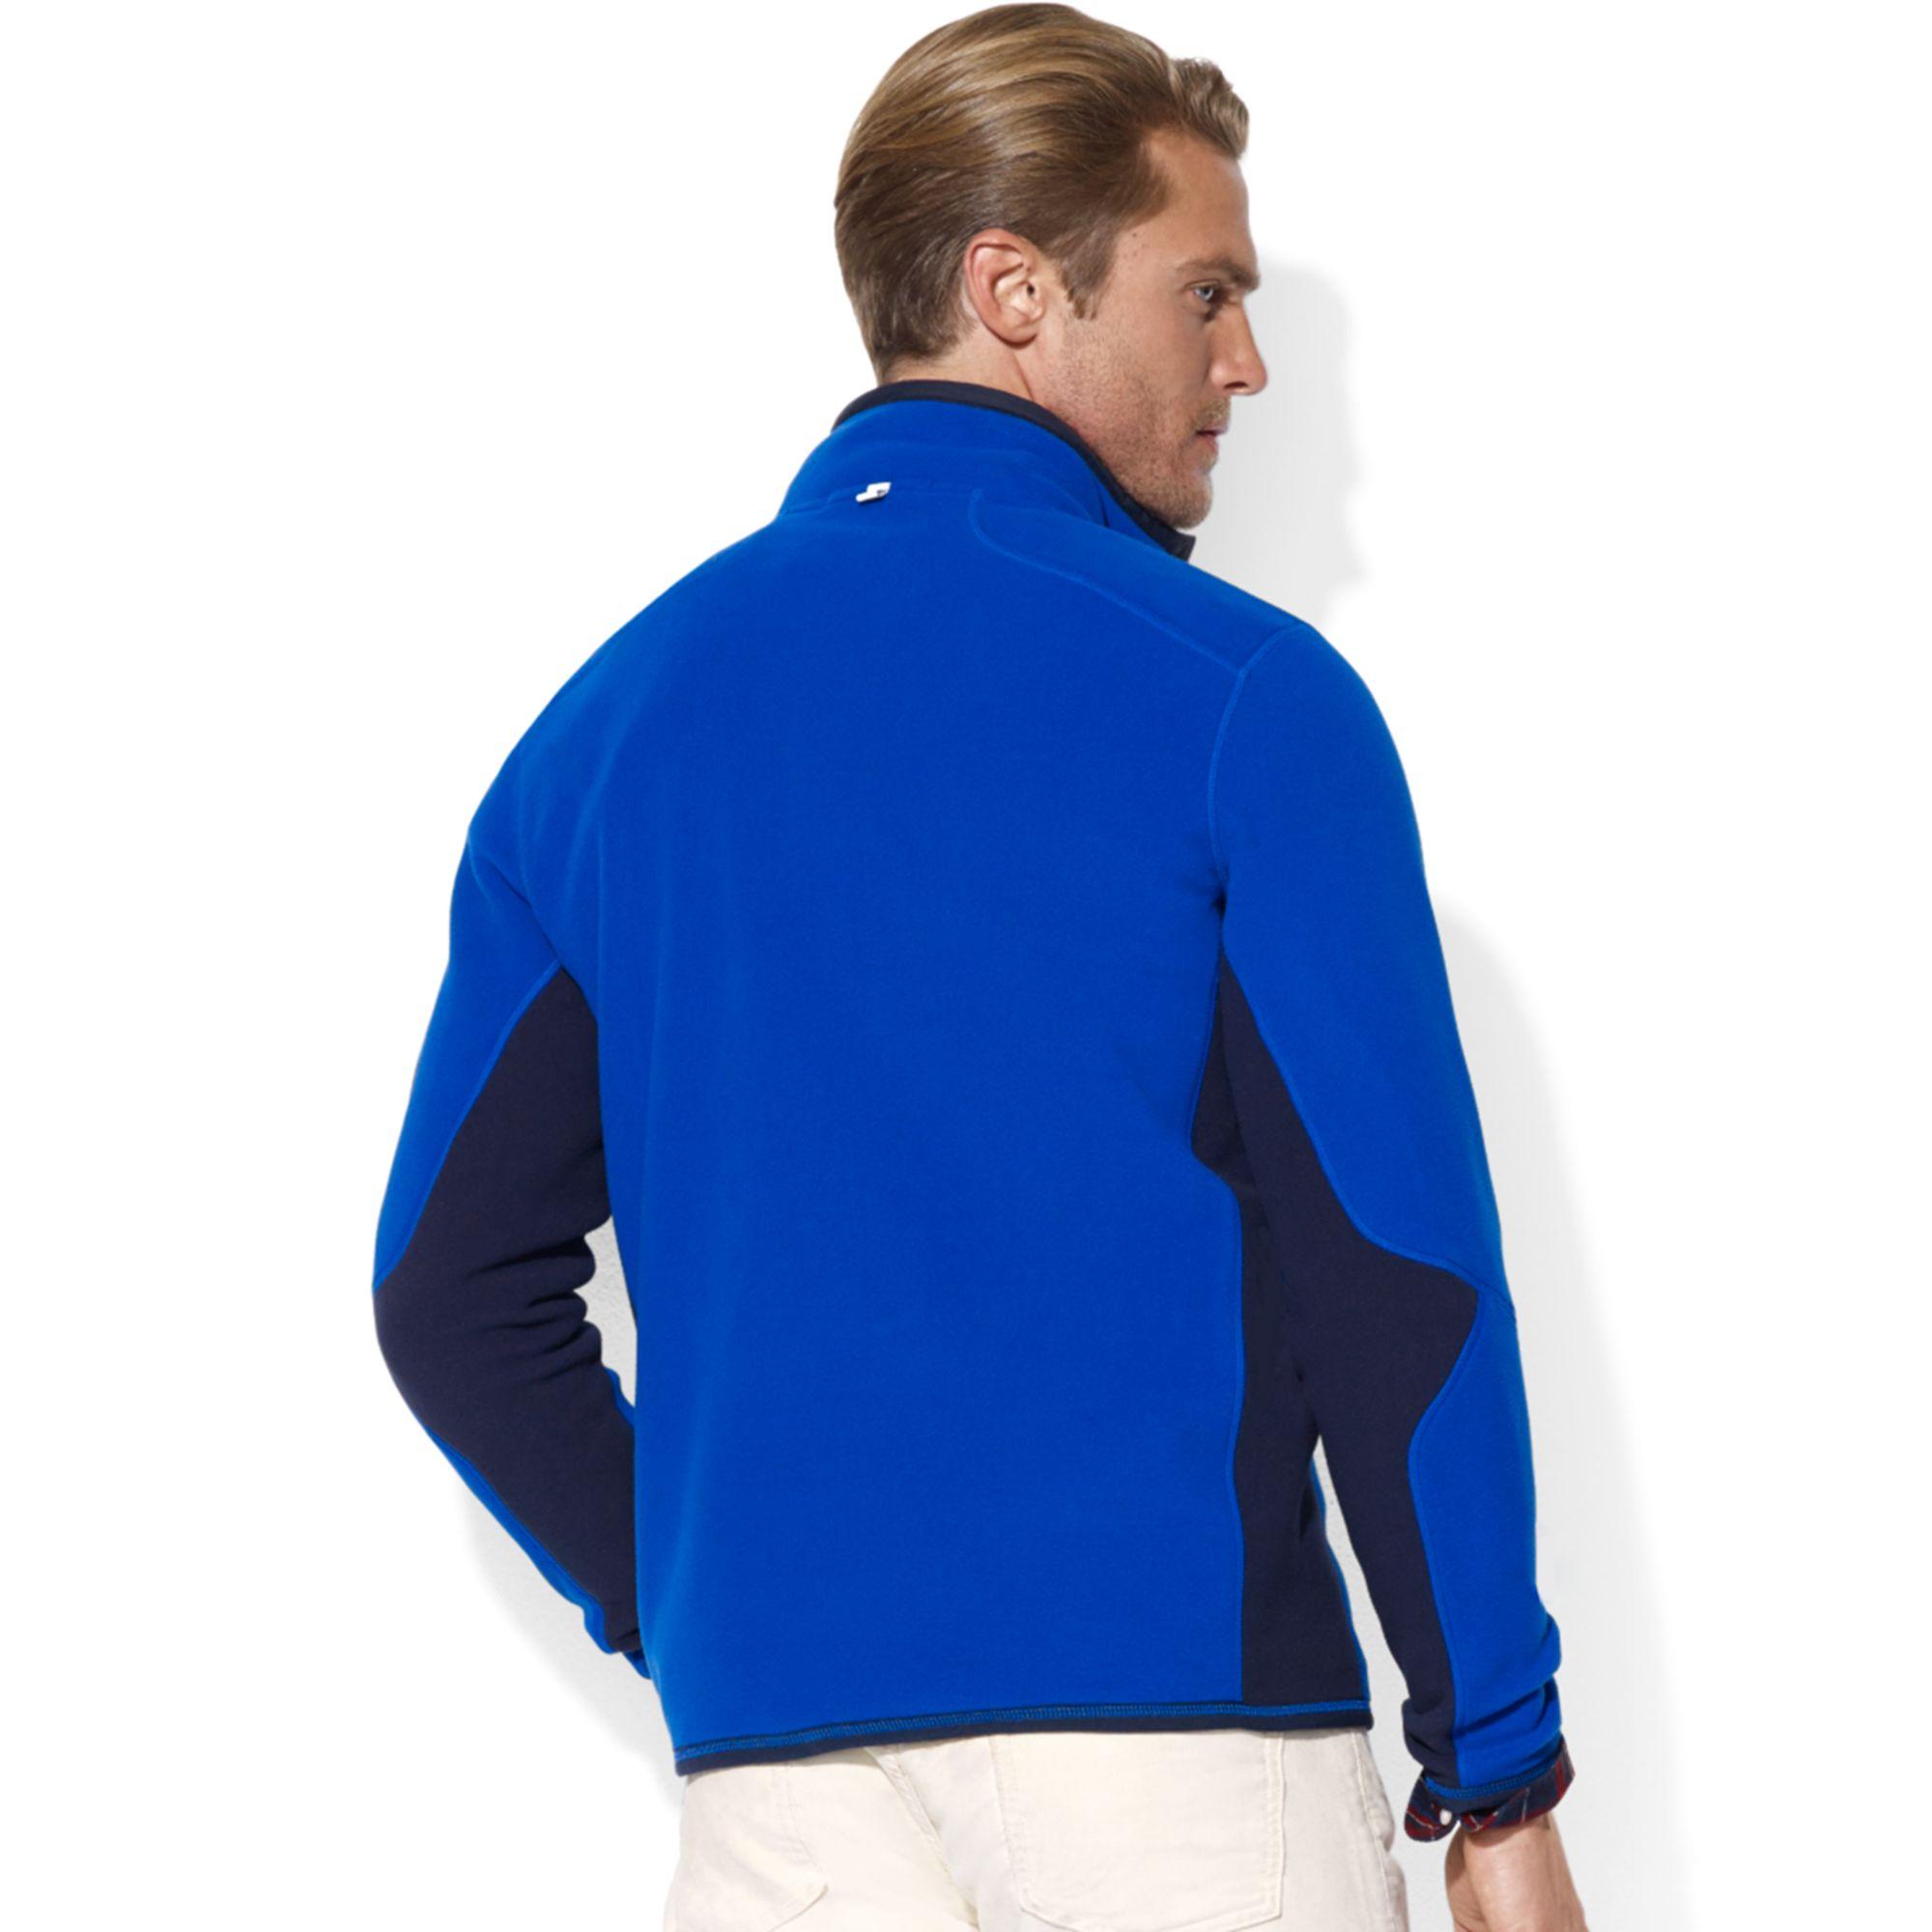 Ralph lauren Usa Polar Mock Neck Fleece Jacket in Blue for Men | Lyst